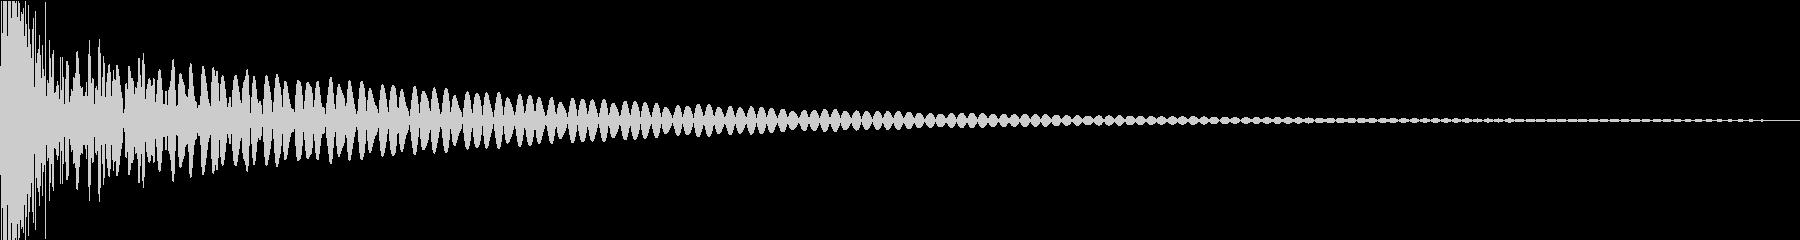 DTM Tom 24 オリジナル音源の未再生の波形